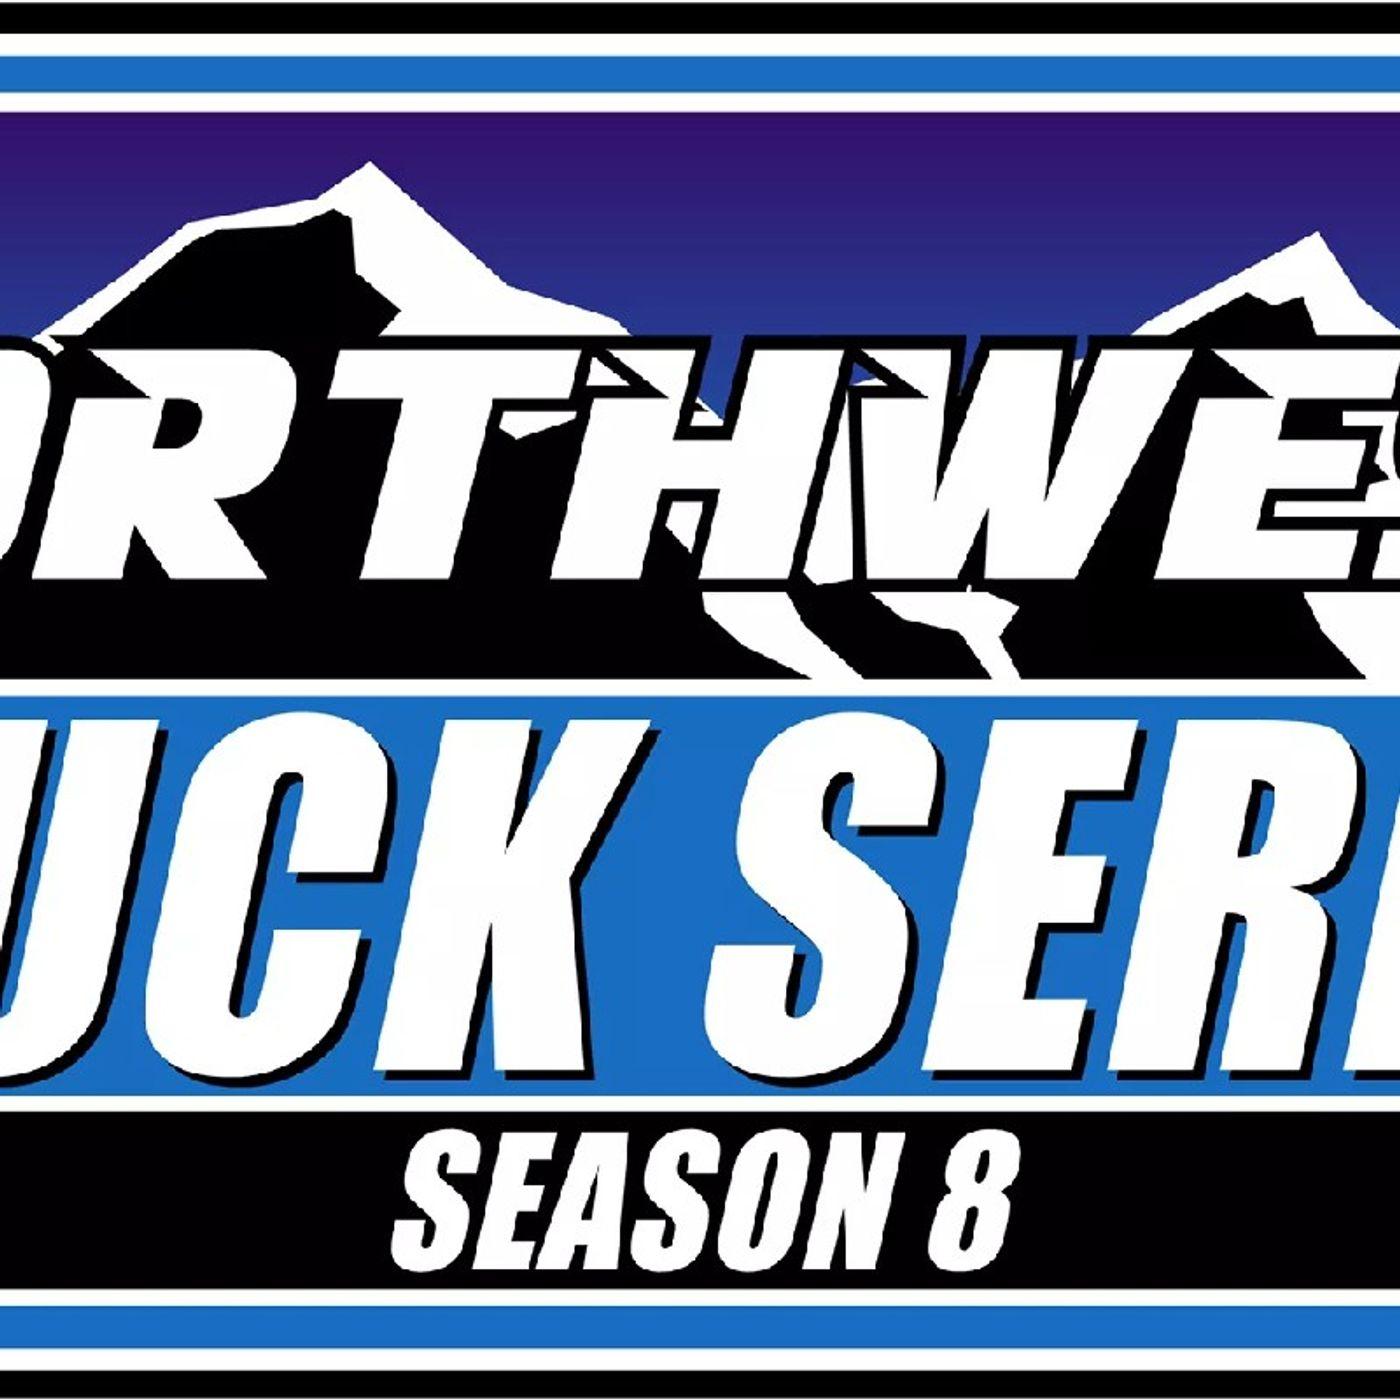 Northwest iRacing Truck Series from virtual Richmond (VA) Raceway! #CRNeSports #WeAreCRN 🎮🎤🎧